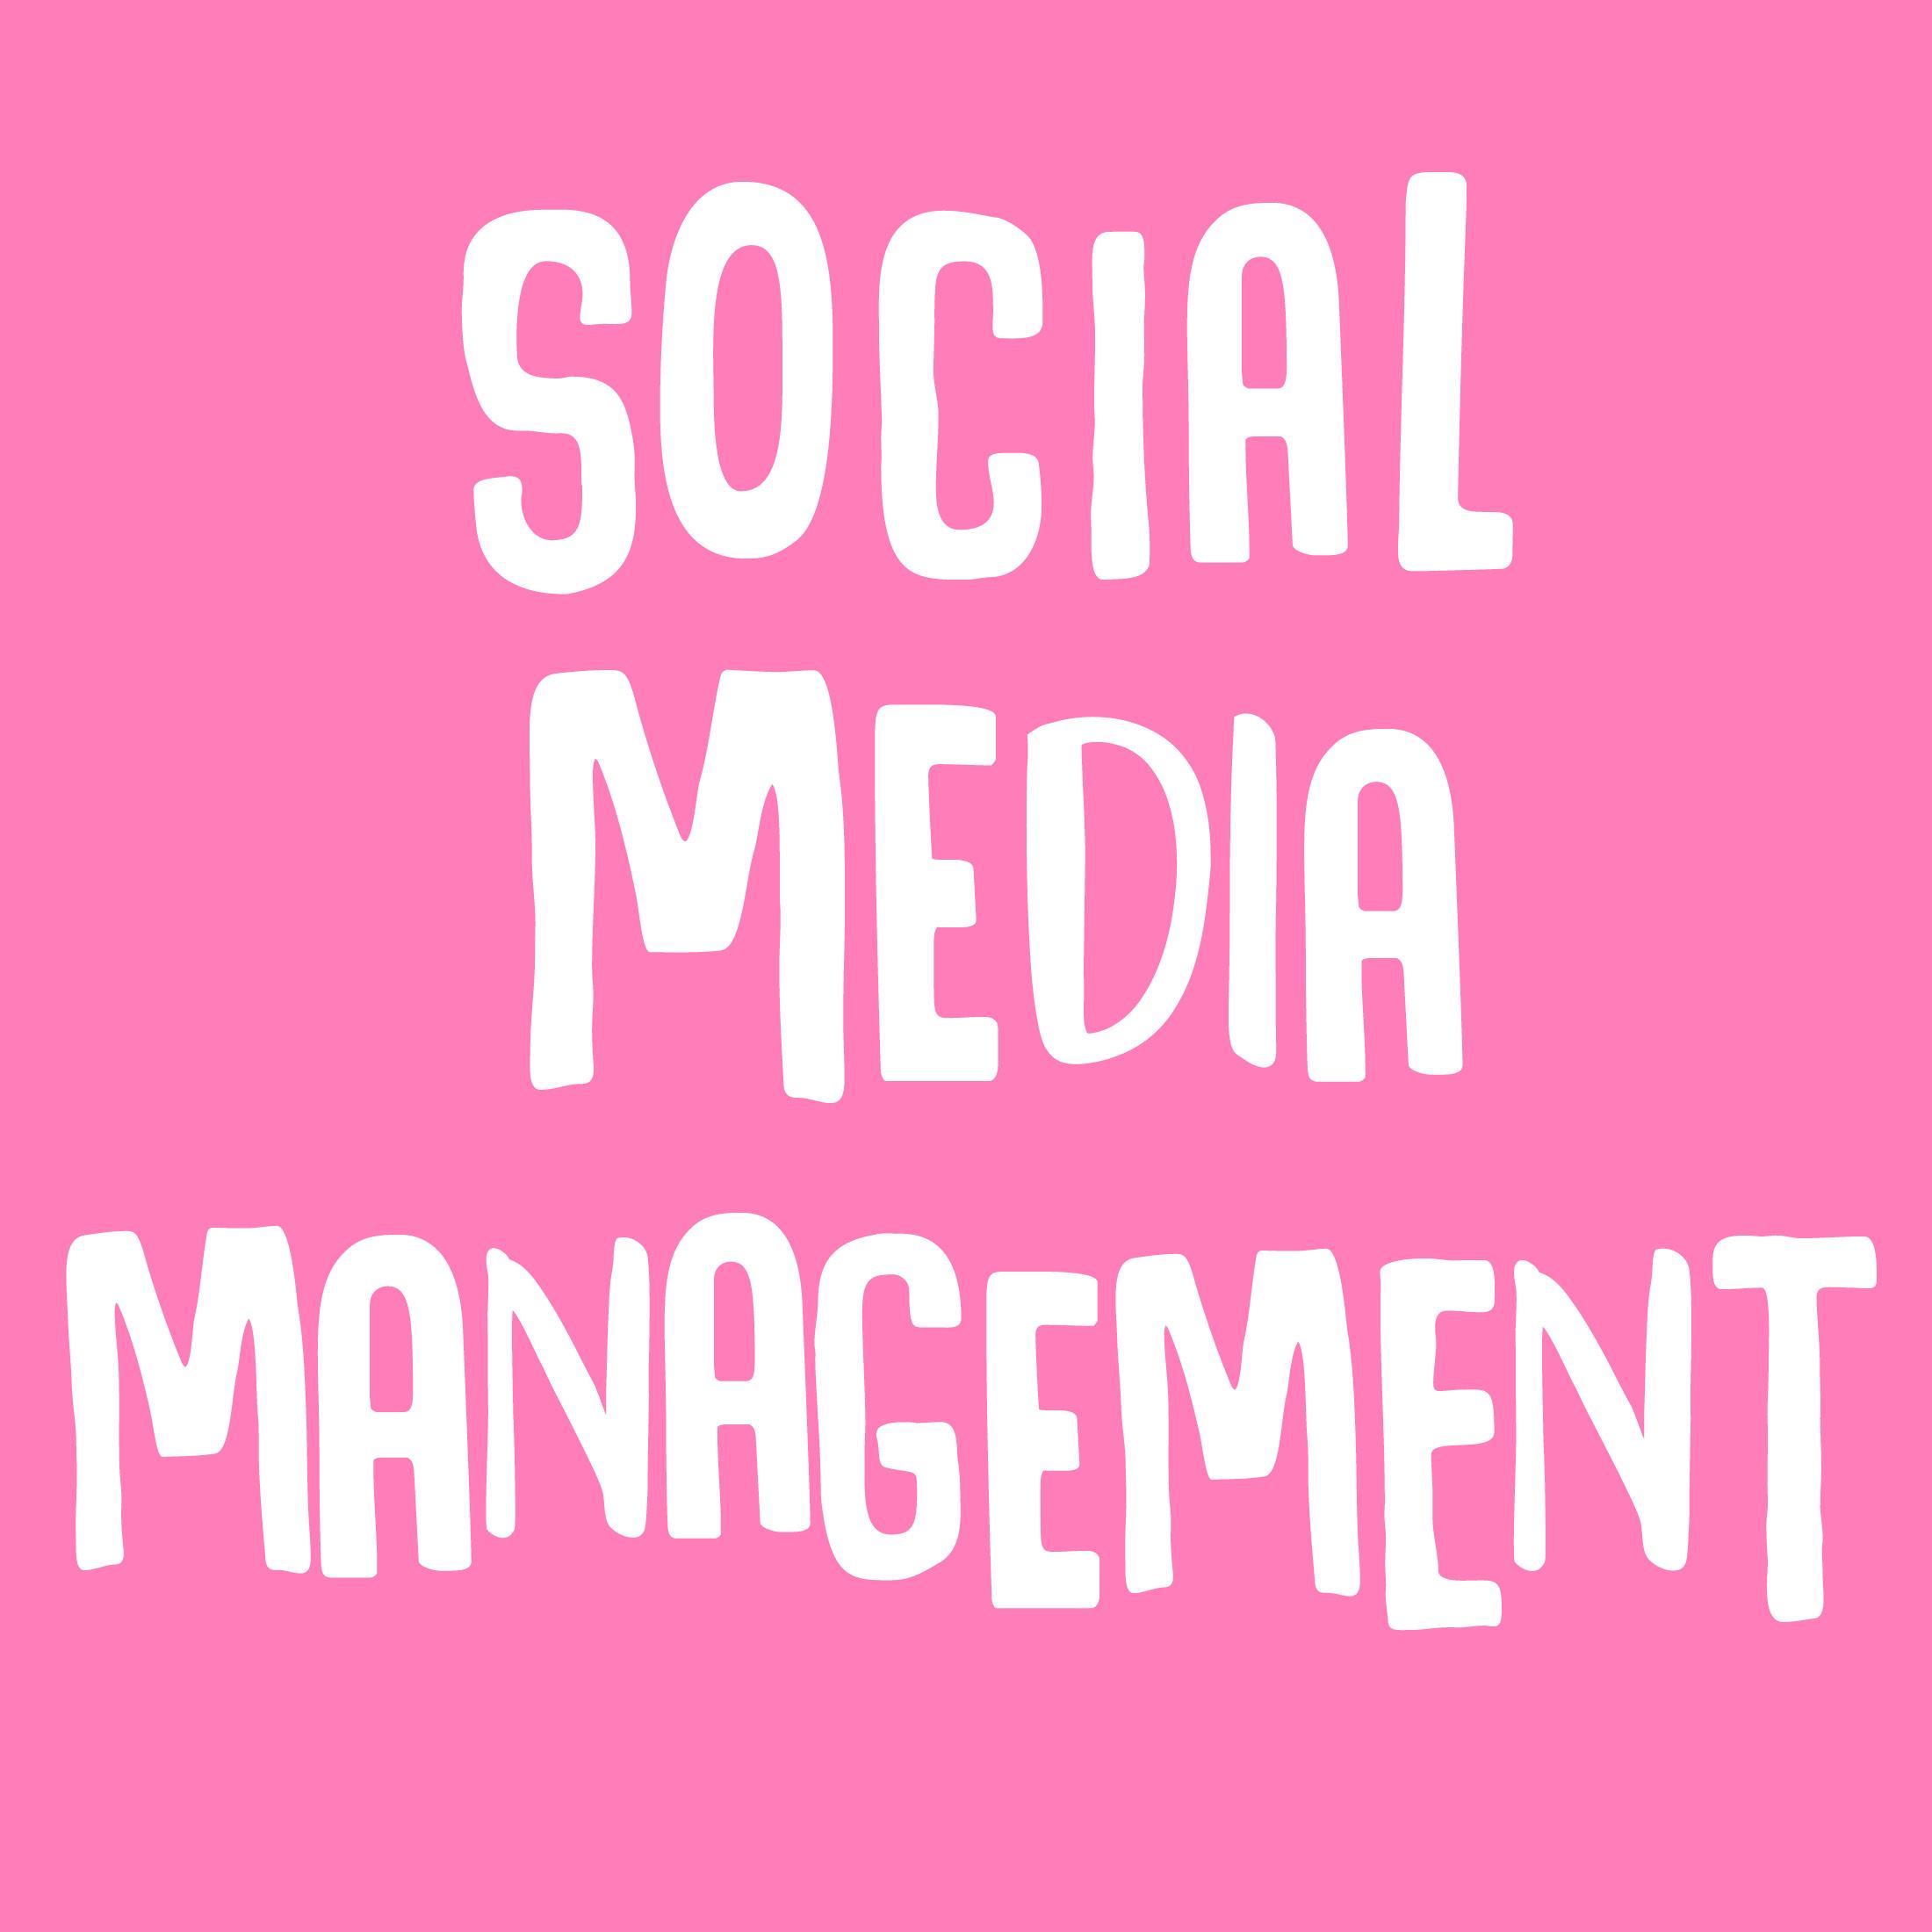 socialmediamanagement.jpg